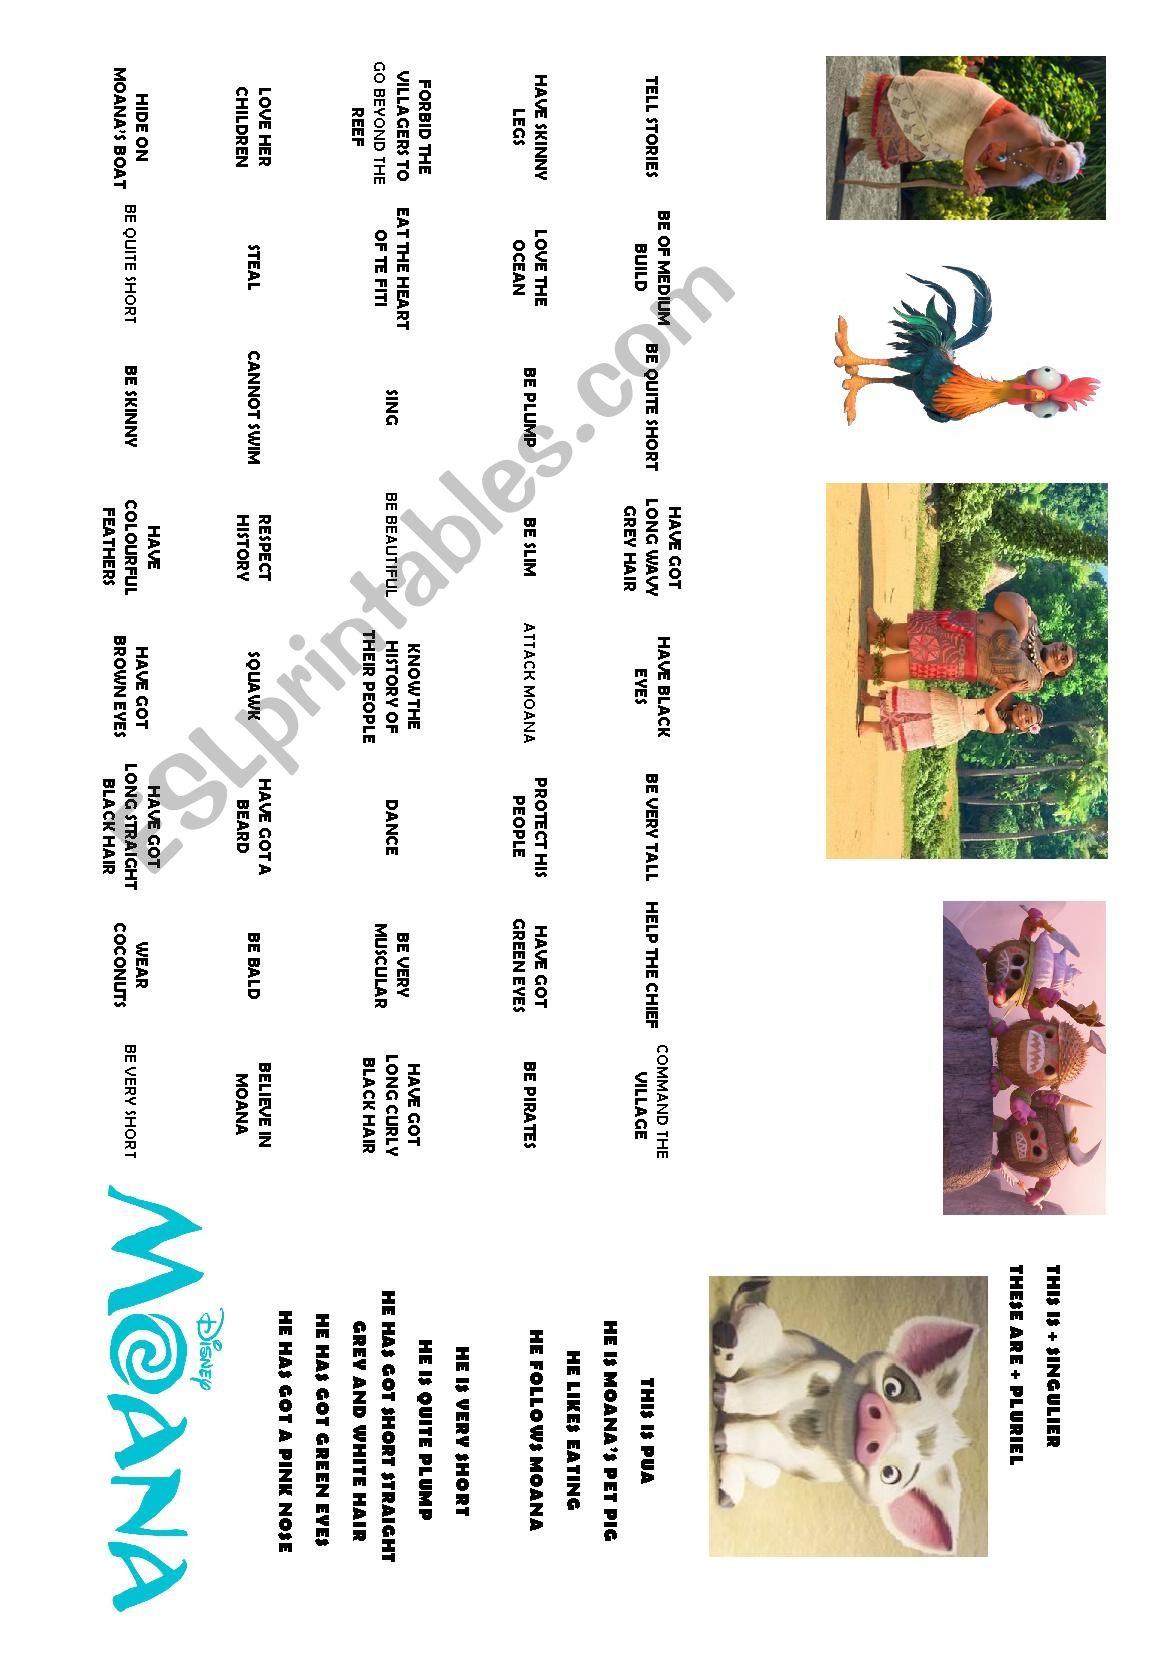 Moana Vaiana Worksheet 3 Describing The Character